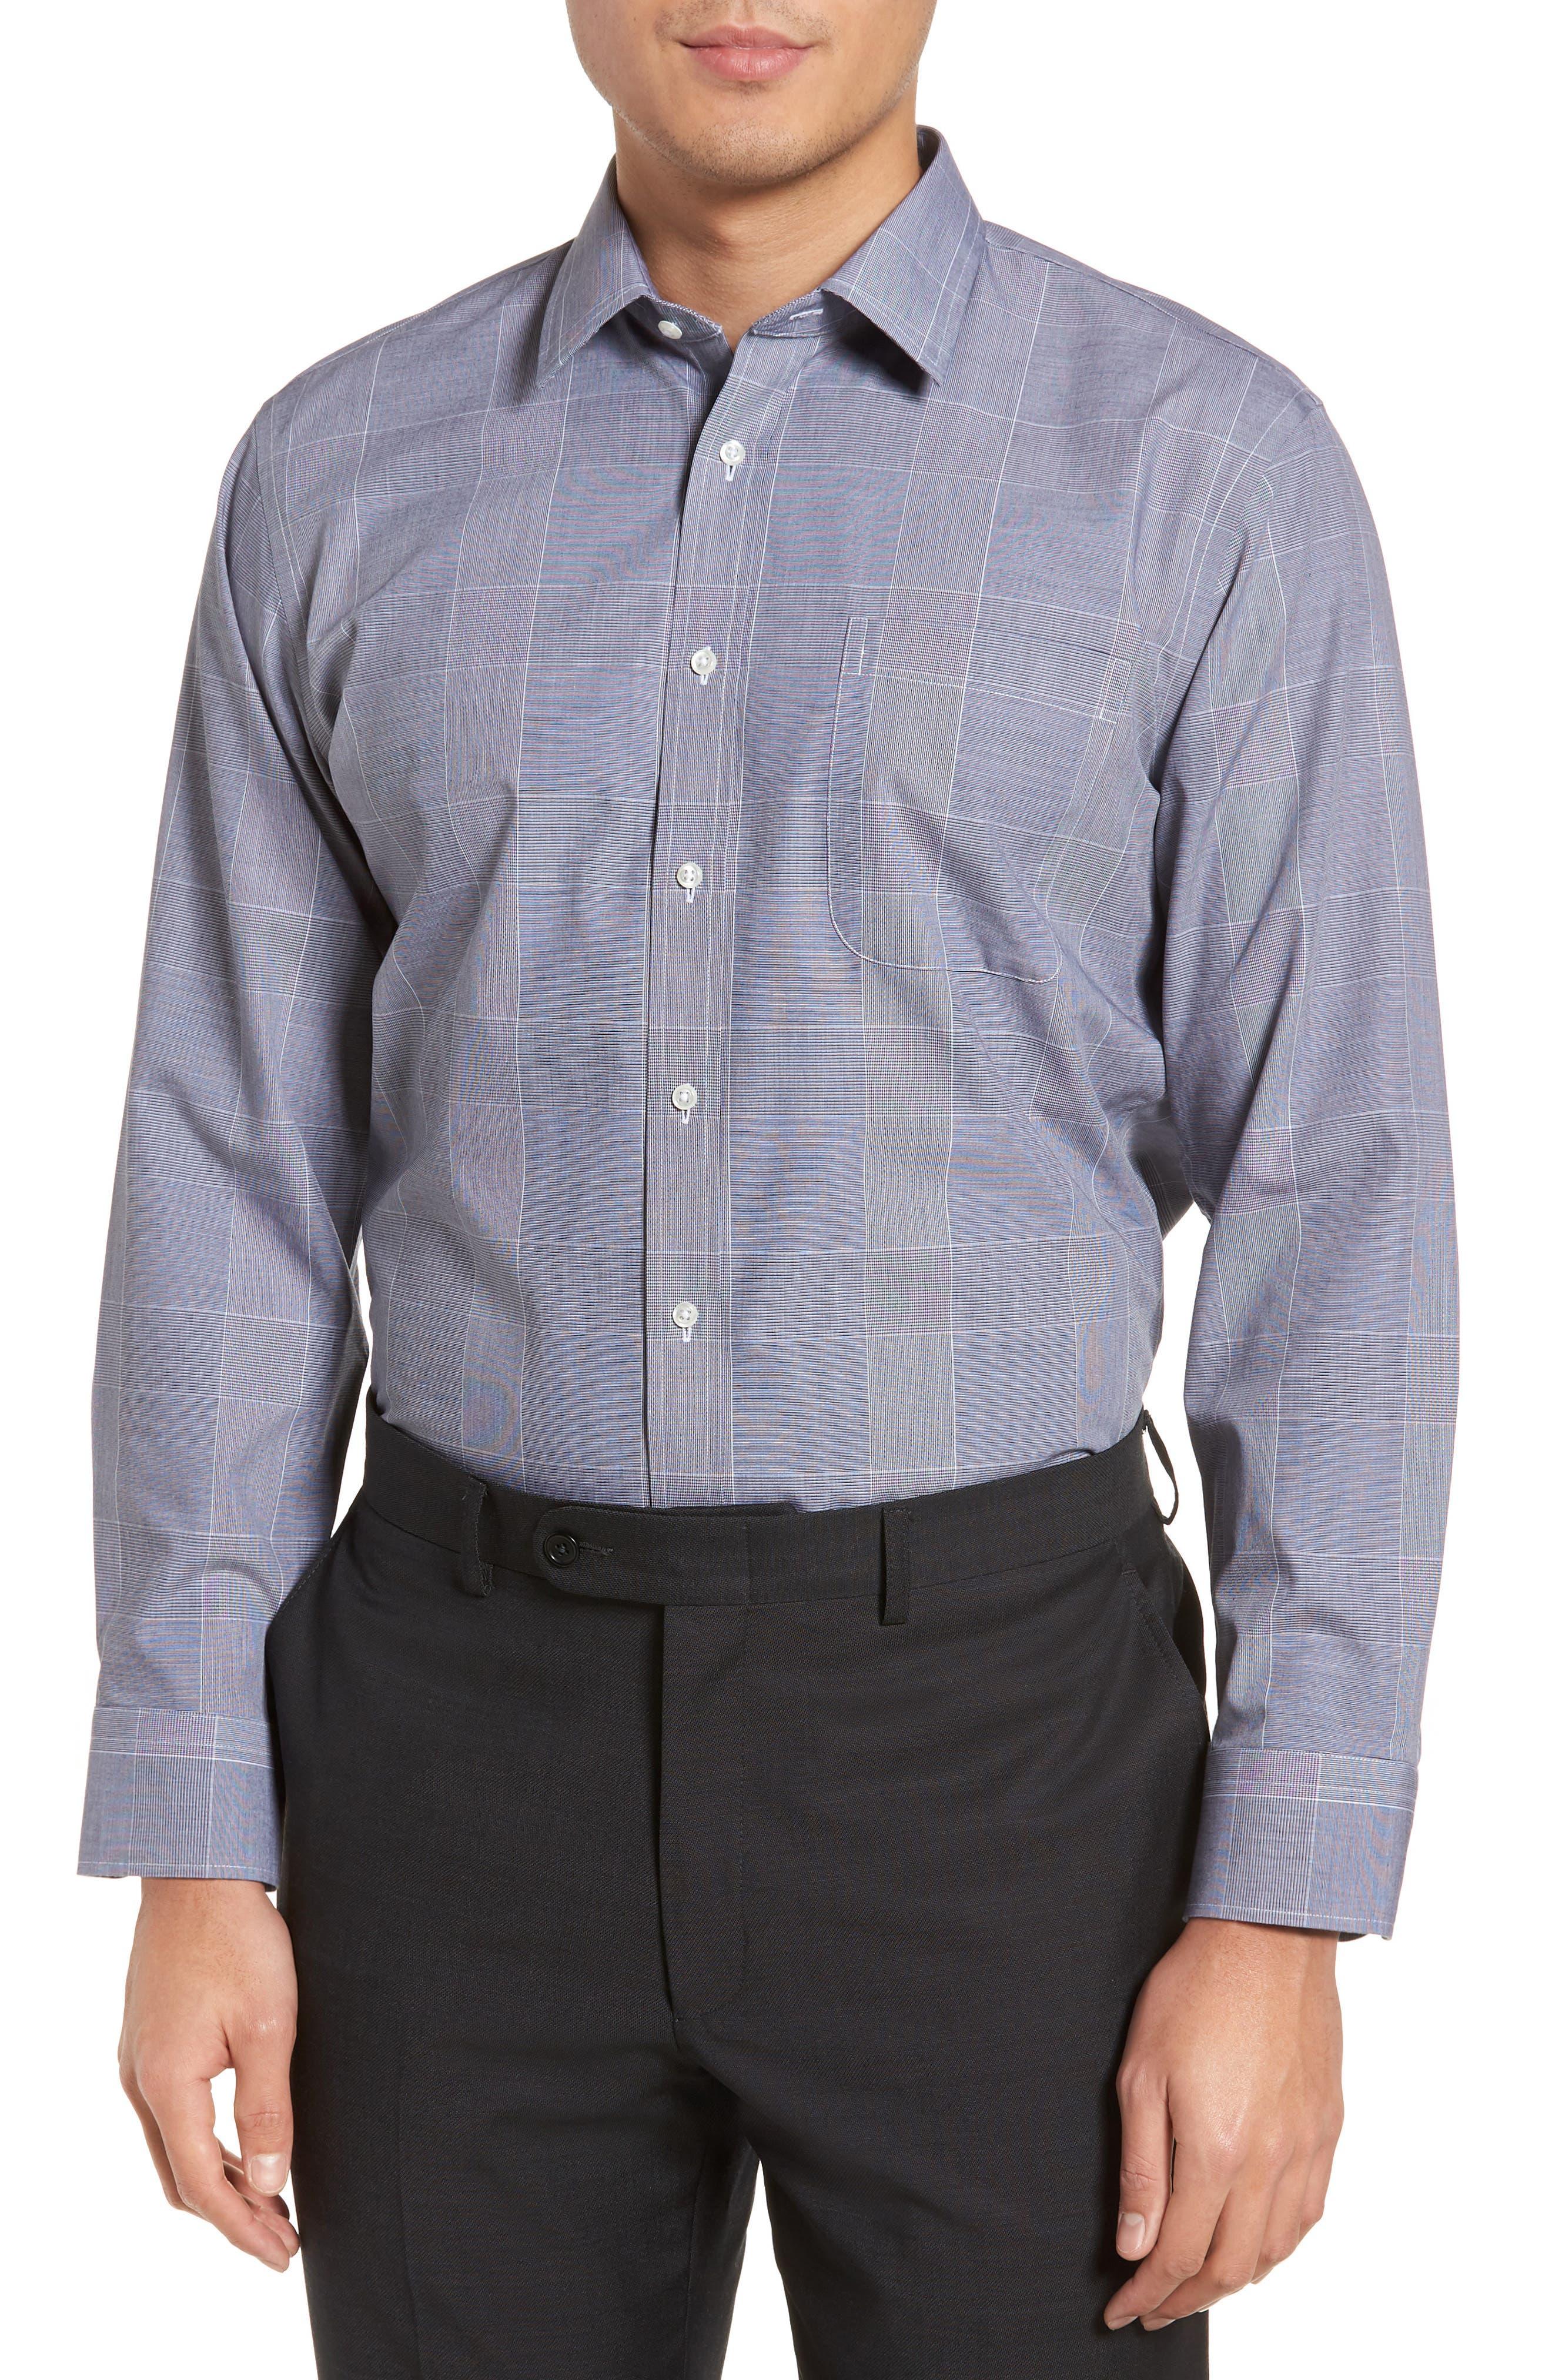 Alternate Image 1 Selected - Nordstrom Men's Shop Smartcare™ Trim Fit Plaid Dress Shirt